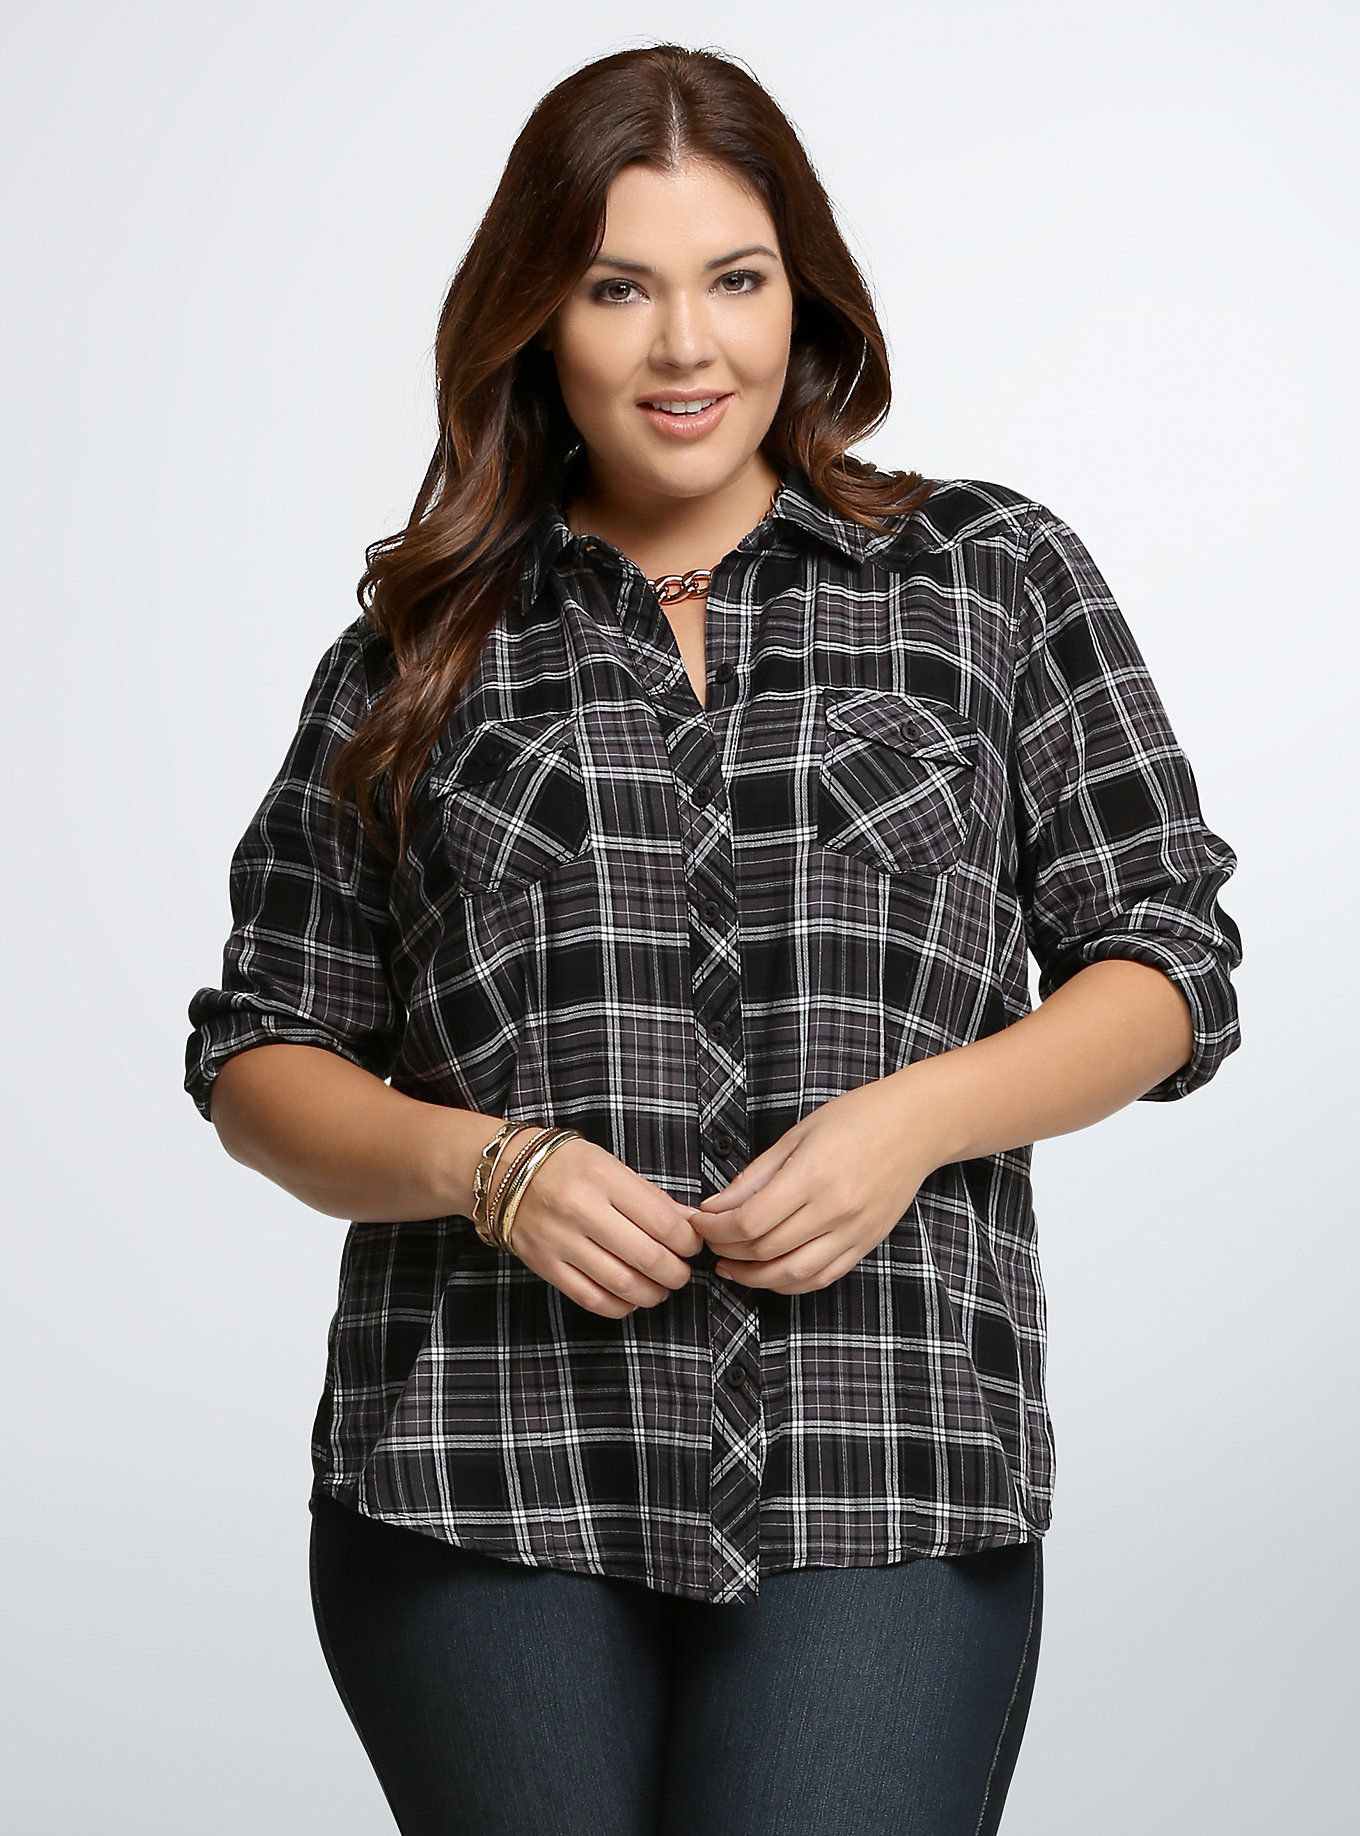 Flannel shirt plus size  Plaid Camp Shirt  Camp shirts Torrid and Plaid